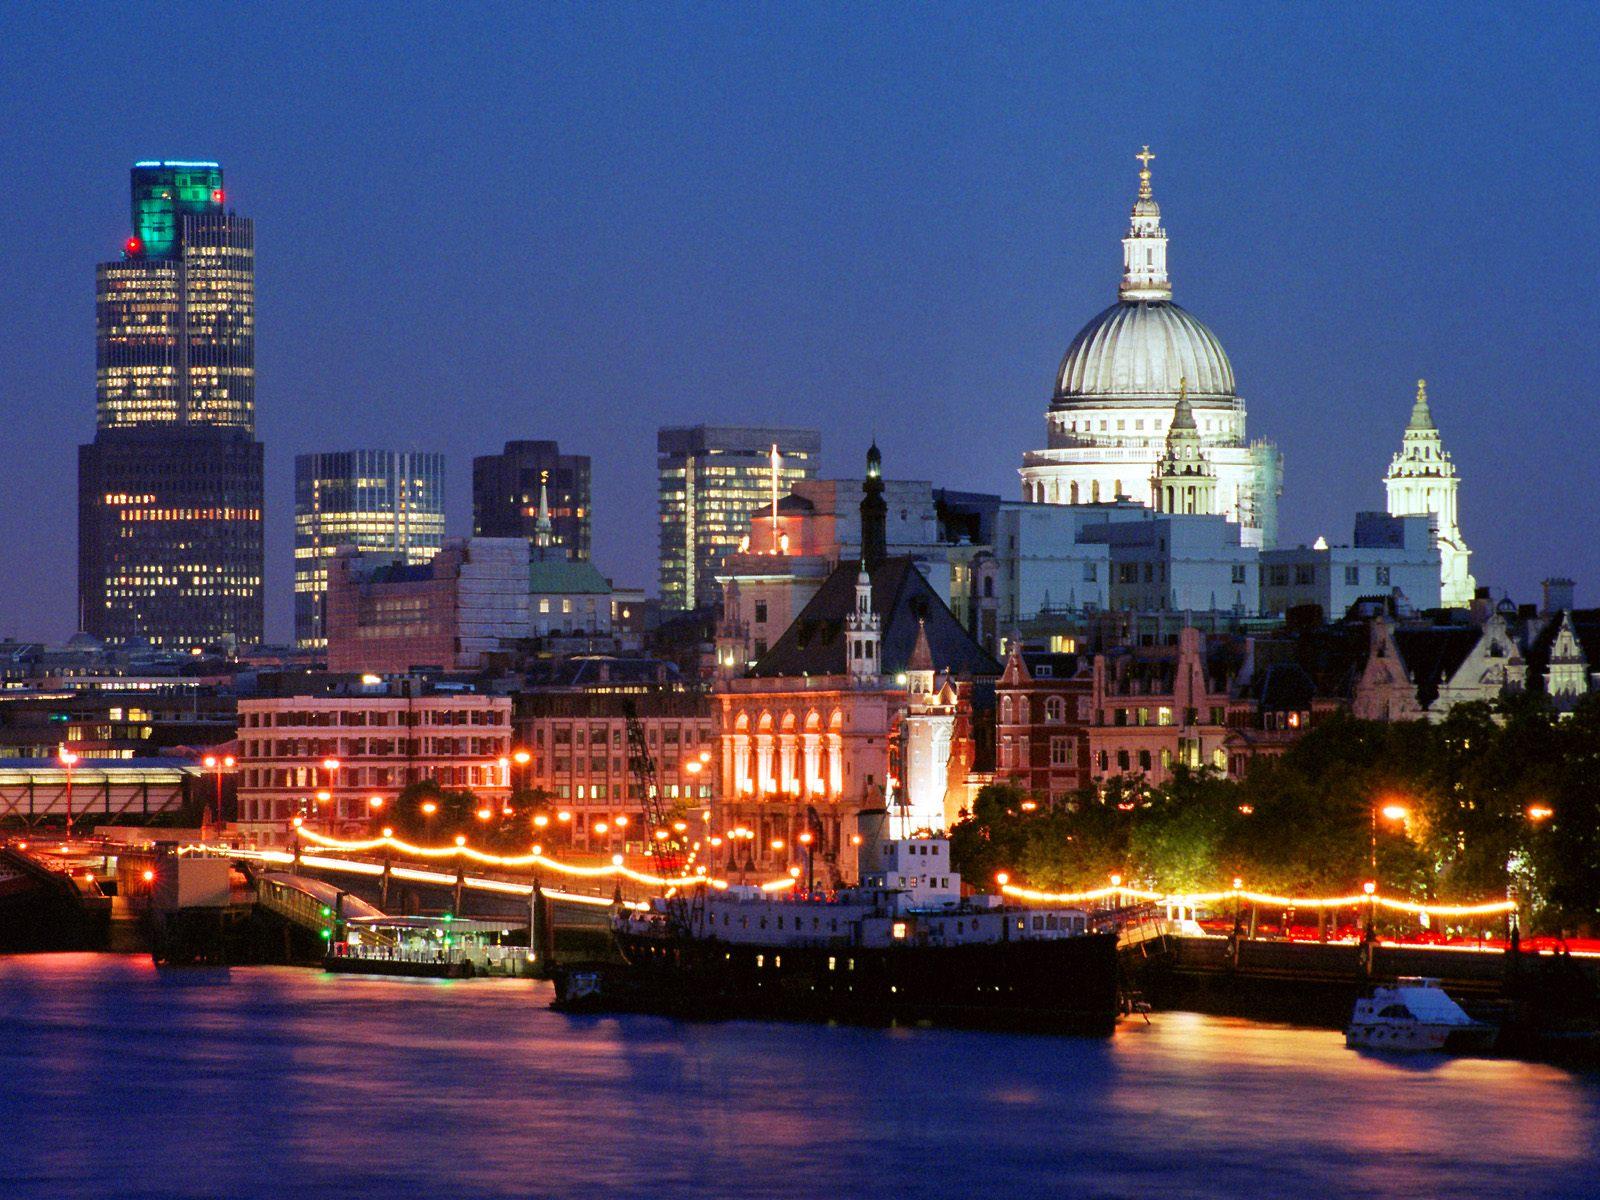 Great Britain images London, England wallpaper photos ...